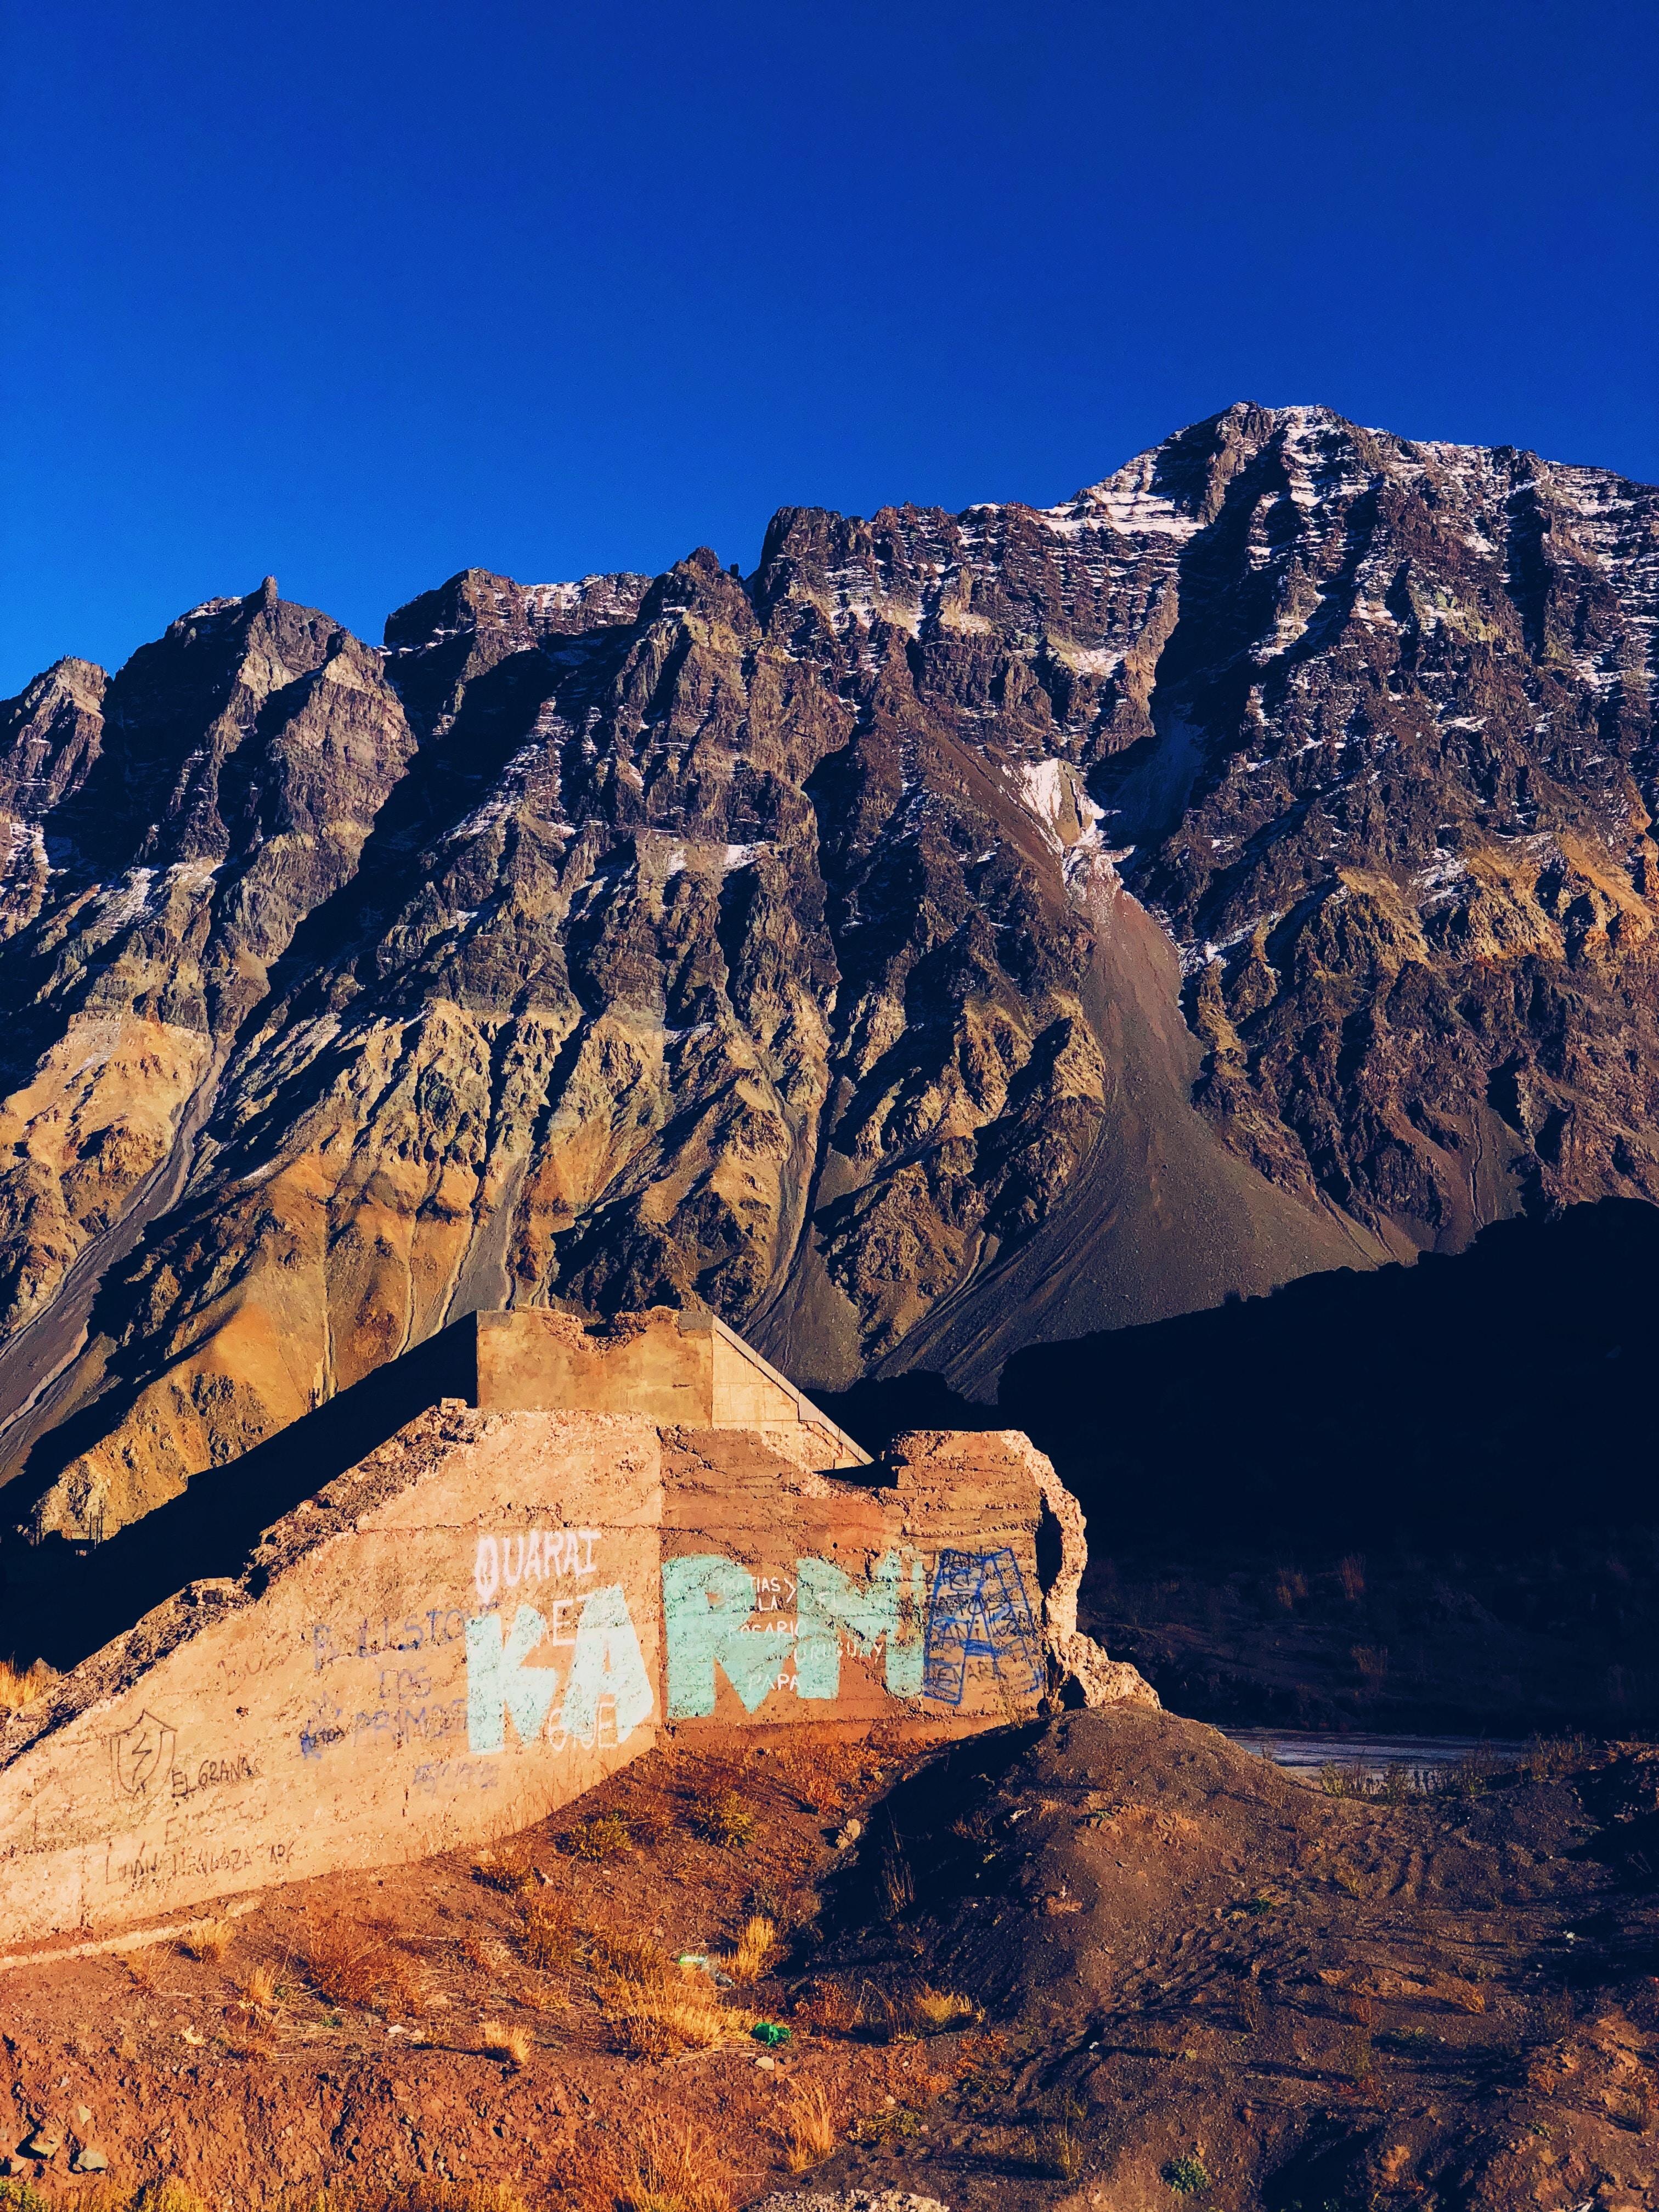 brown and orange mountain